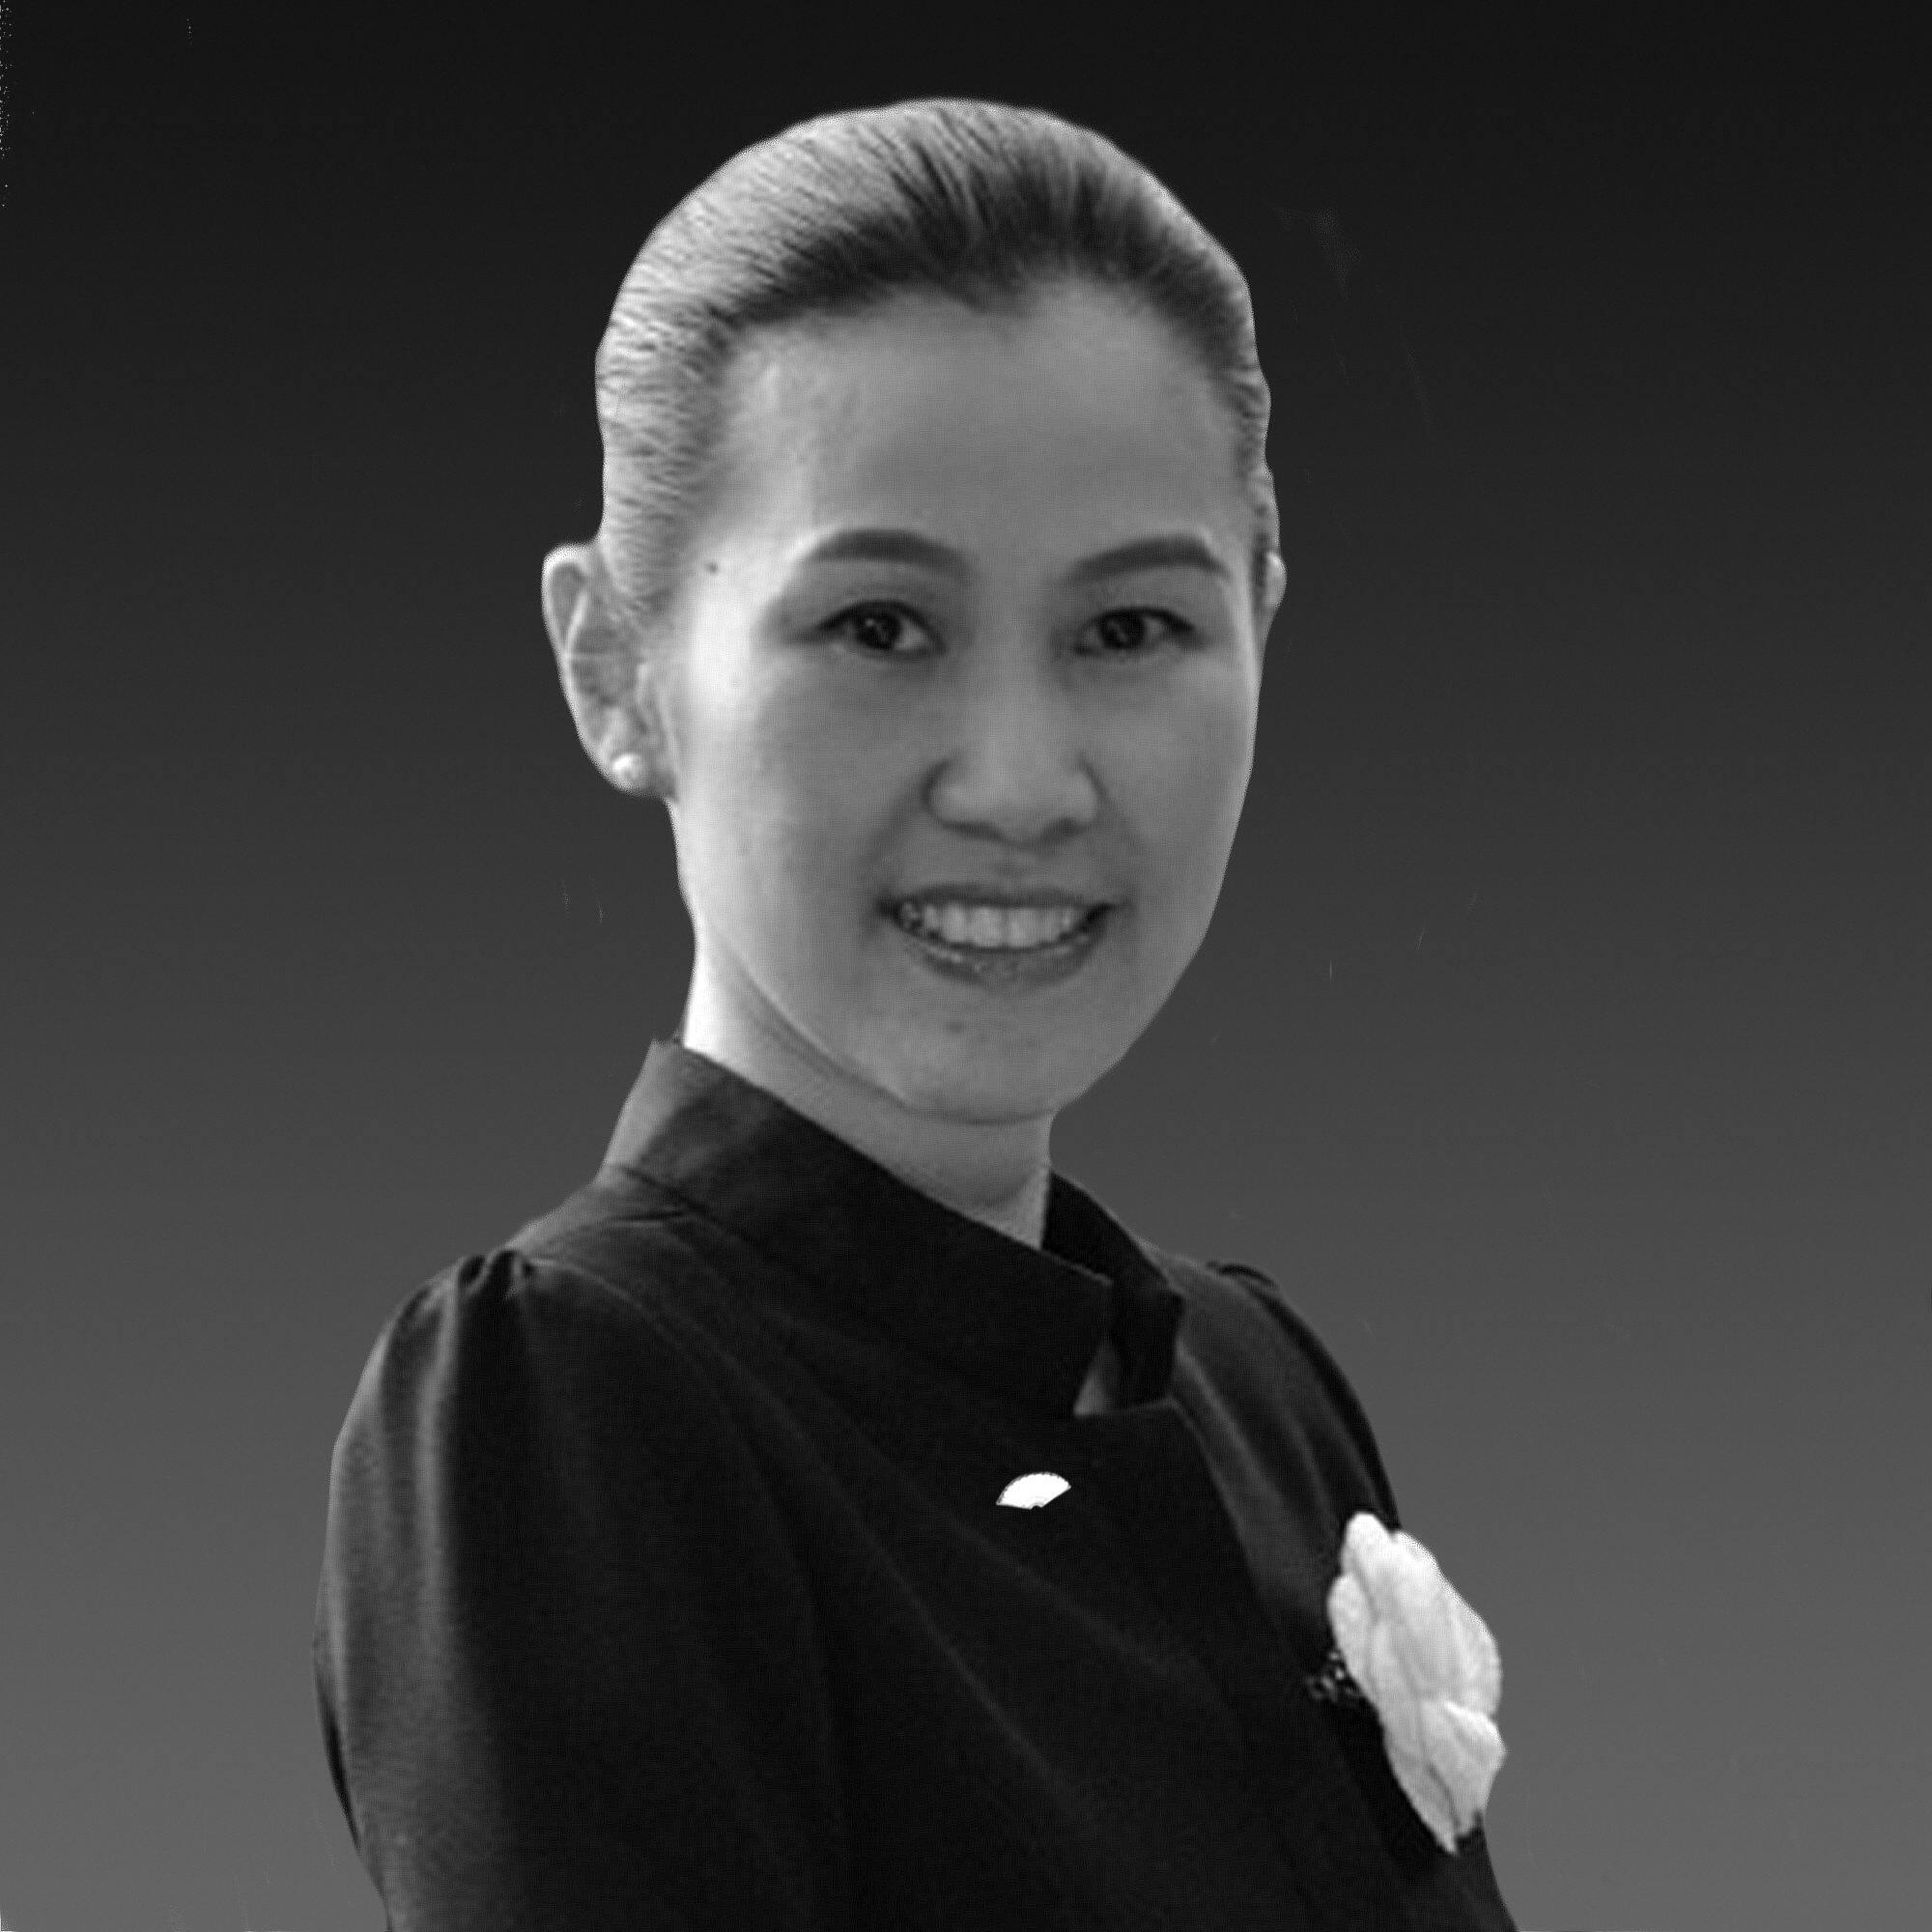 Patama Lerdwittayaskul (Patty), Director of Public Relations